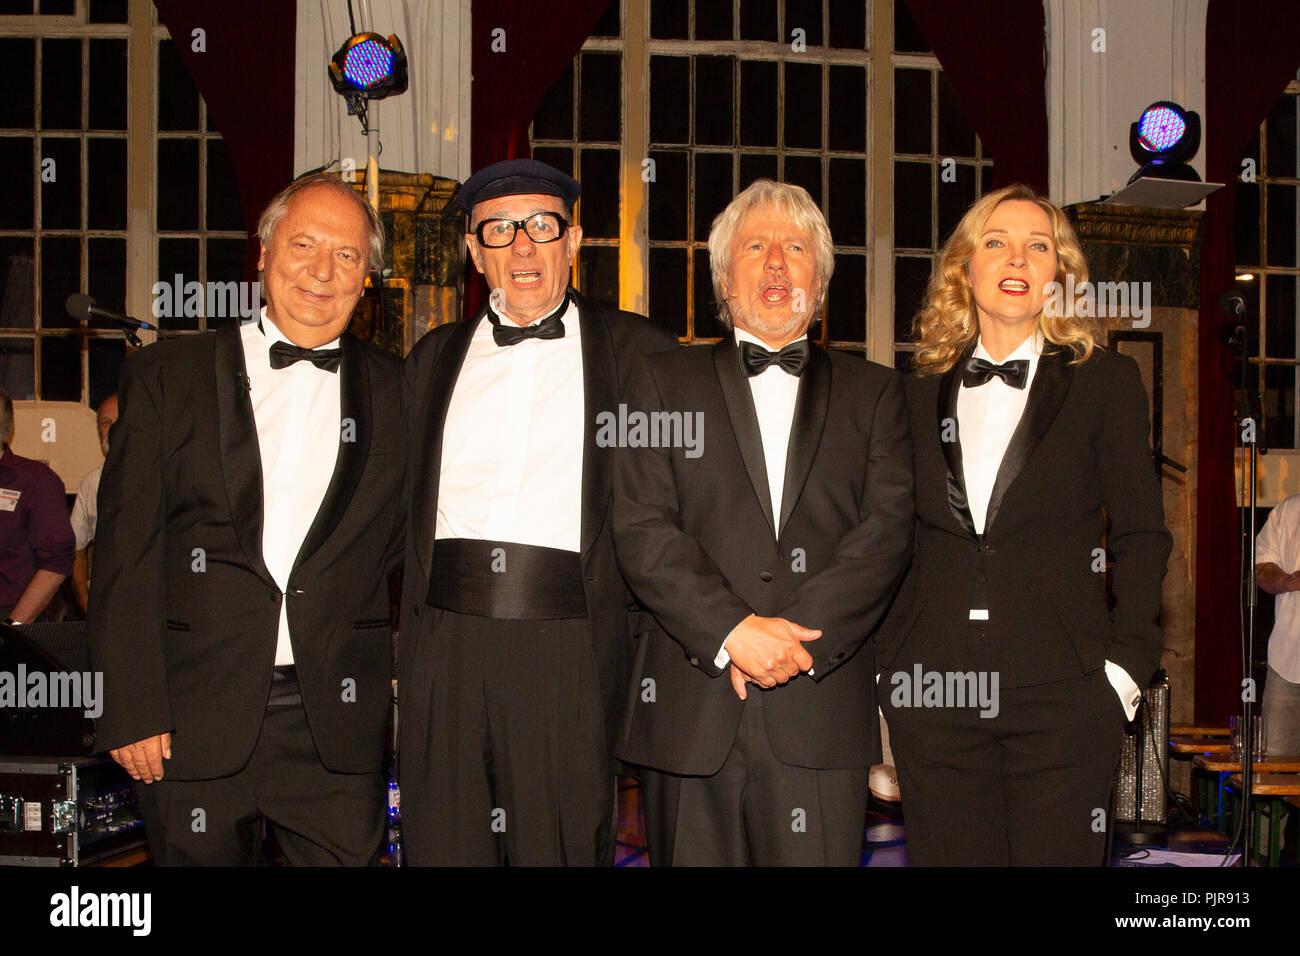 (v.l.) Wilfried Schmickler, Uwe Lyko als Herbert Knebel, Jürgen Becker, Susanne Petzold - Stock Image